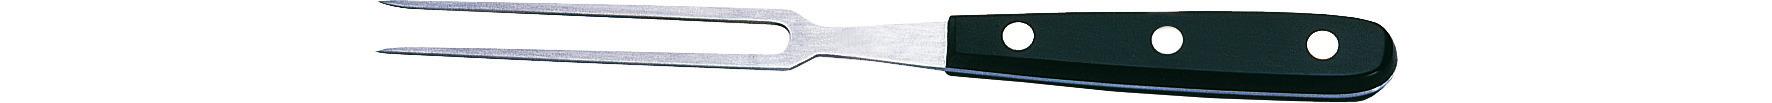 Wurstgabel Klingenlänge 130 mm